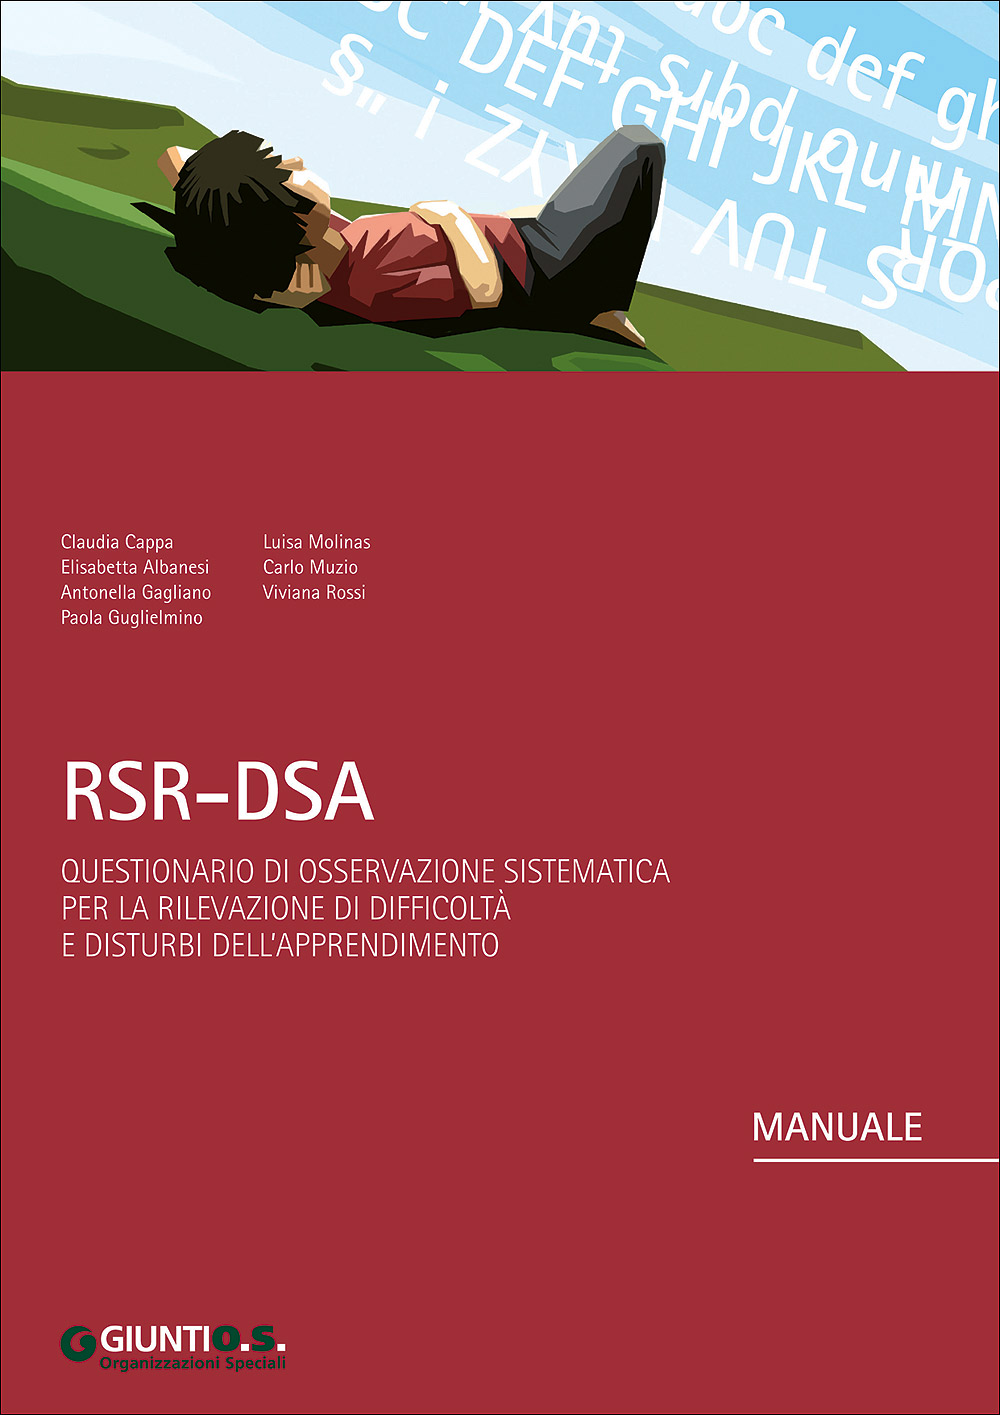 Kit RSR-DSA 3-5